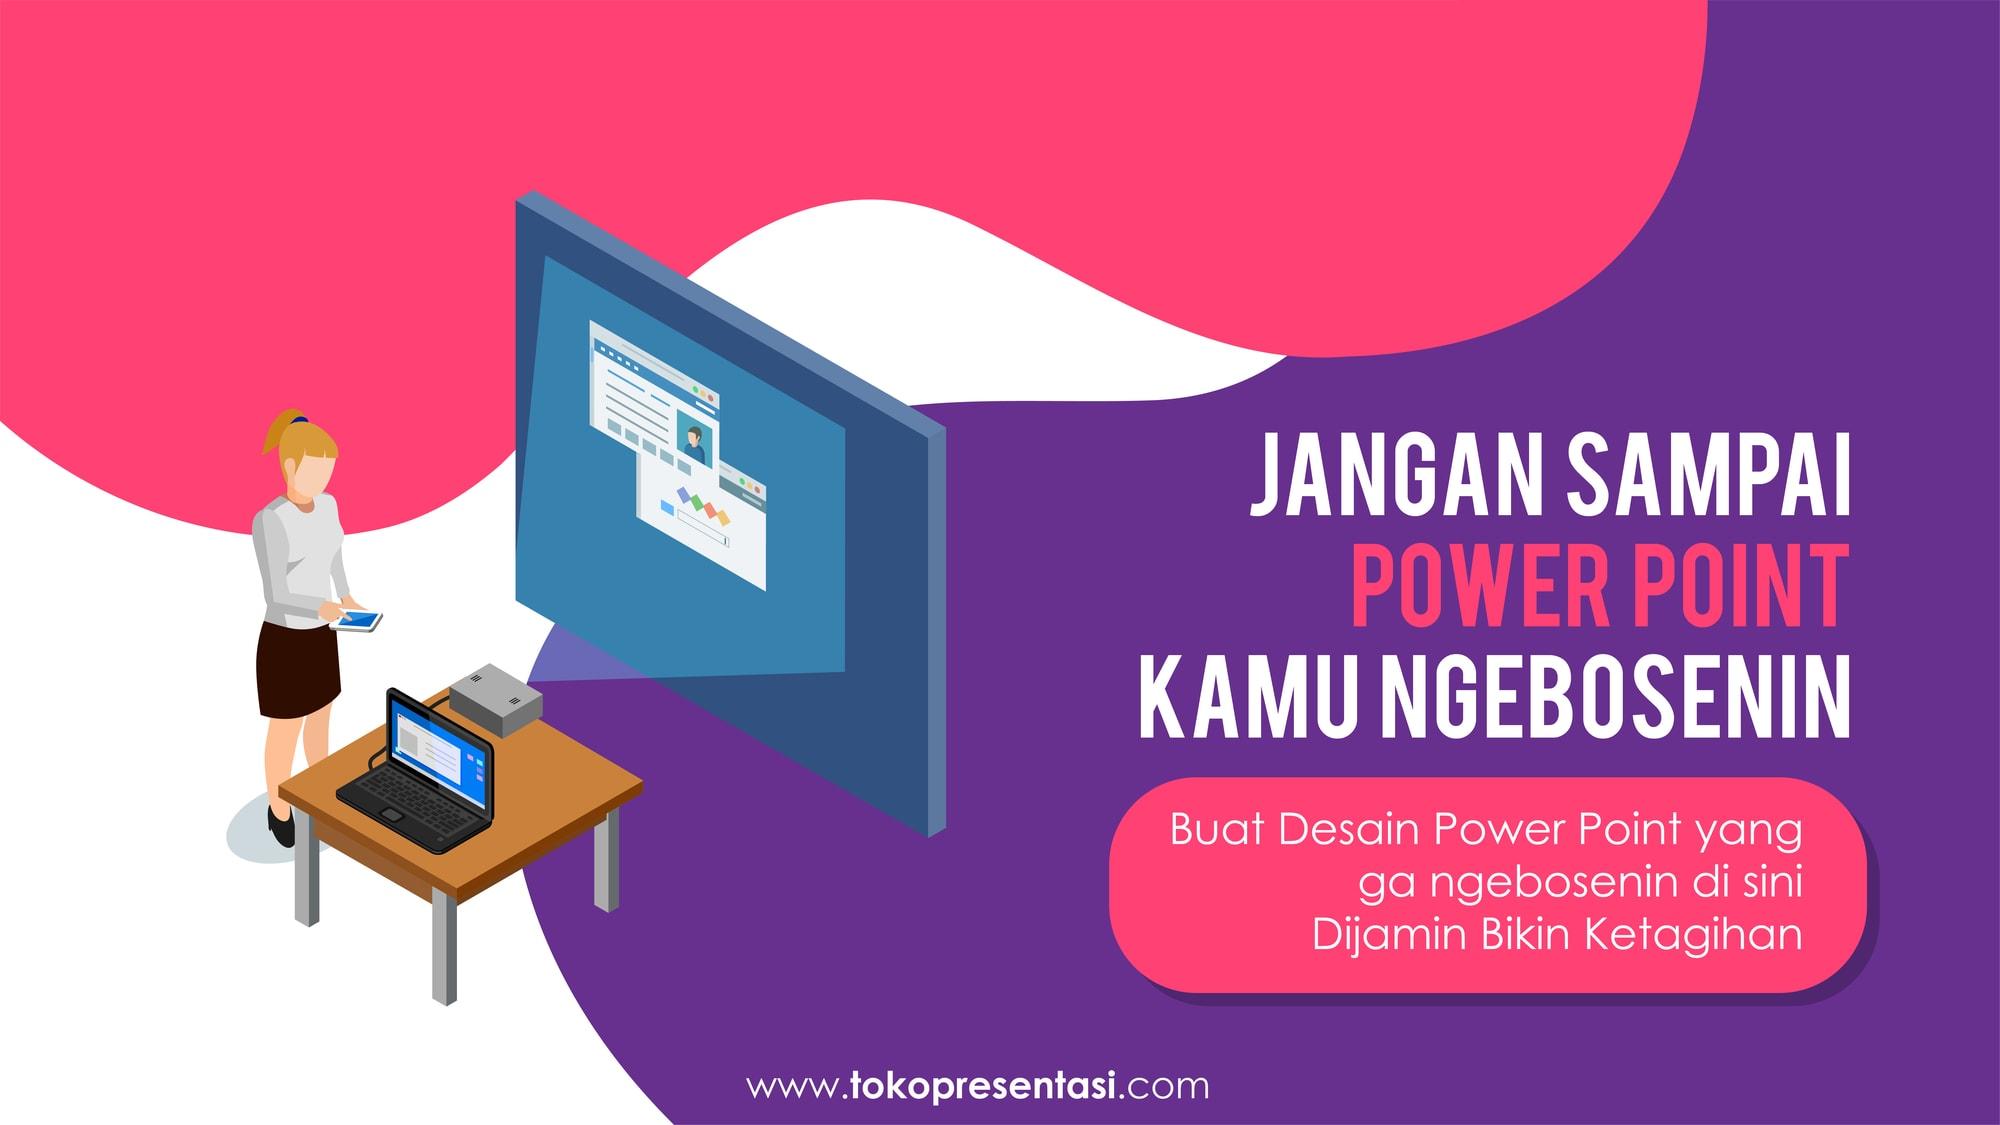 Jasa Pembuatan Desain Presentasi Powerpoint Lomba Inovasi GKM WKM TKMPN Central Pertiwi Bahari Tokopresentasi